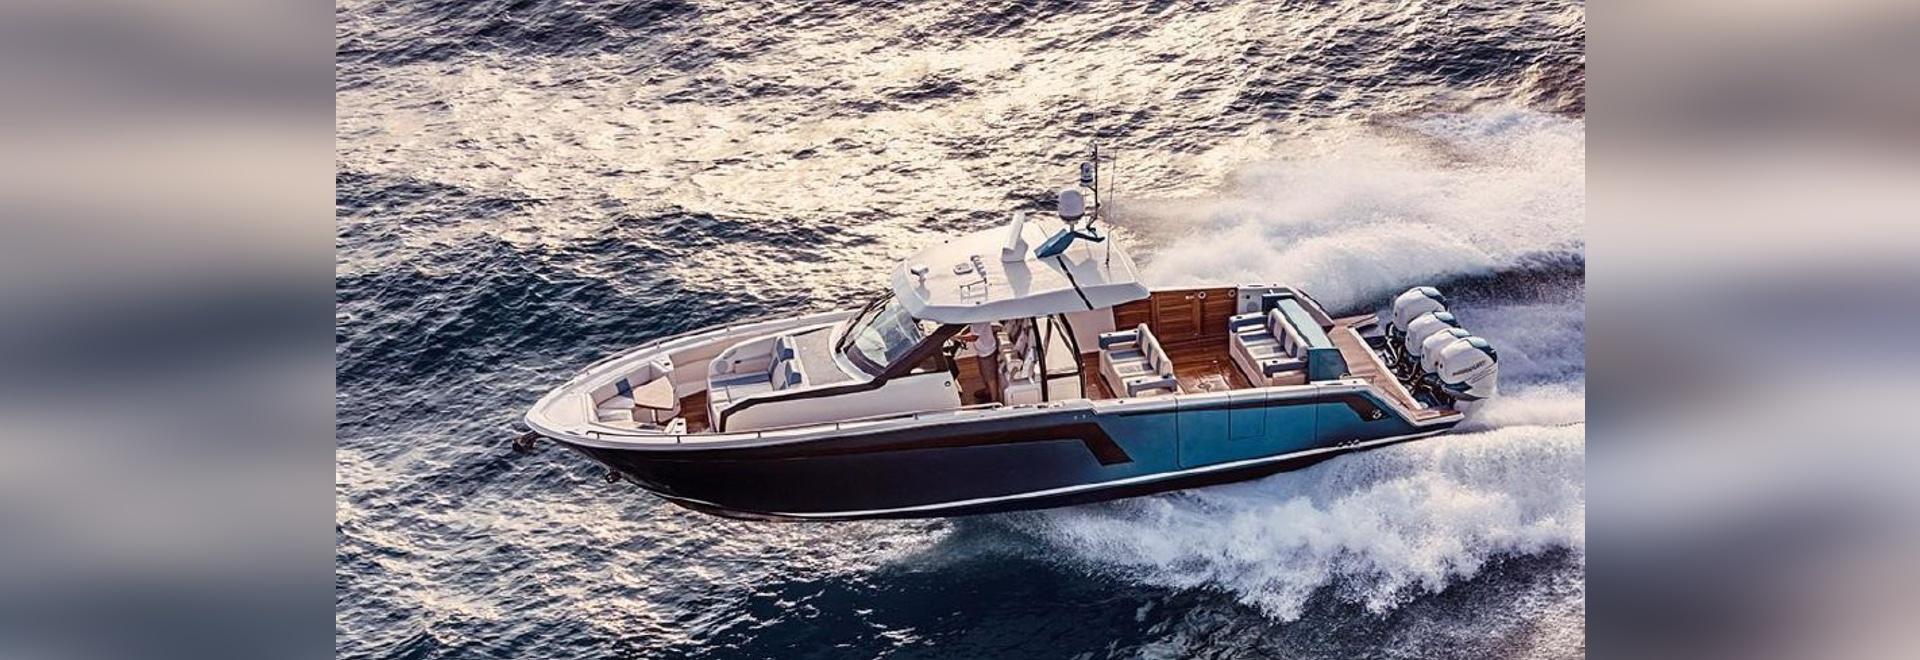 Ocean Alexander 45 Divergence: New dayboat aims to distill superyacht essence